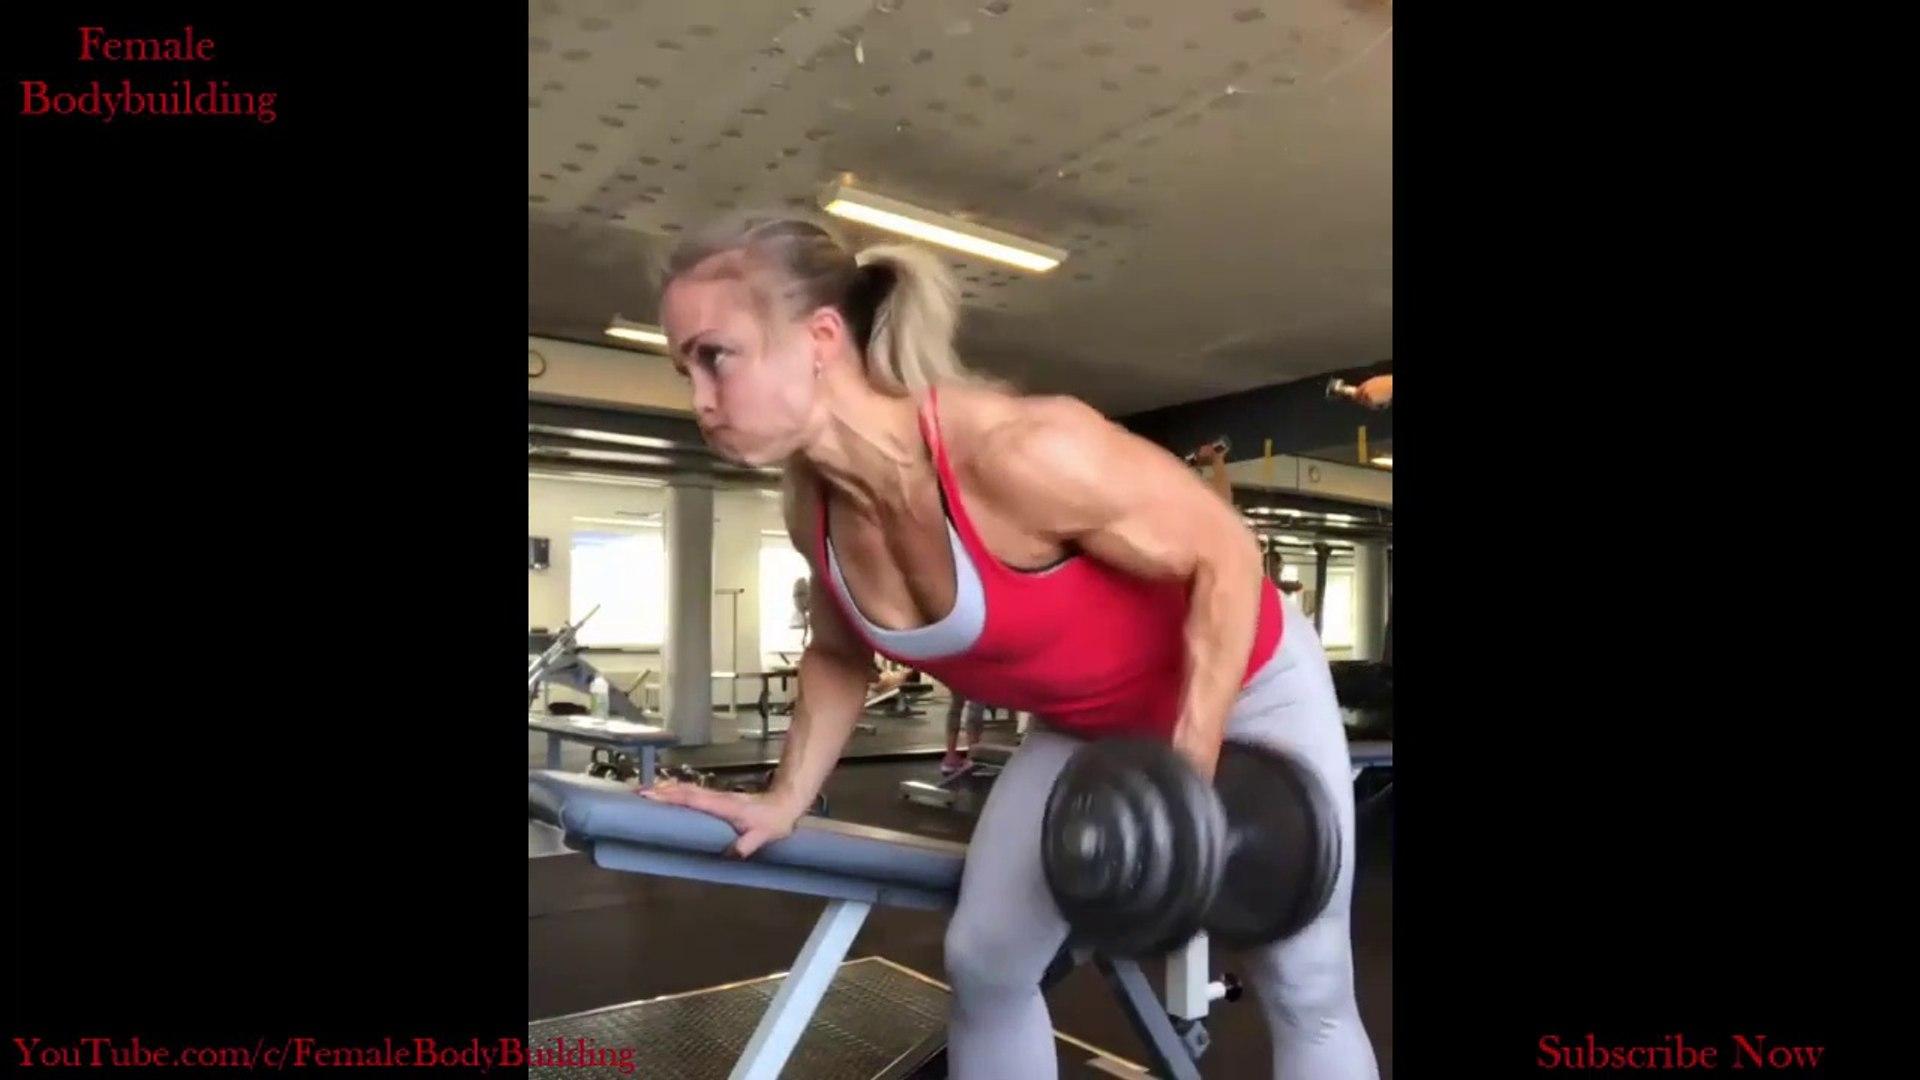 SWEDISH TERMINATOR - Angelica Enberg - Big Biceps Workout